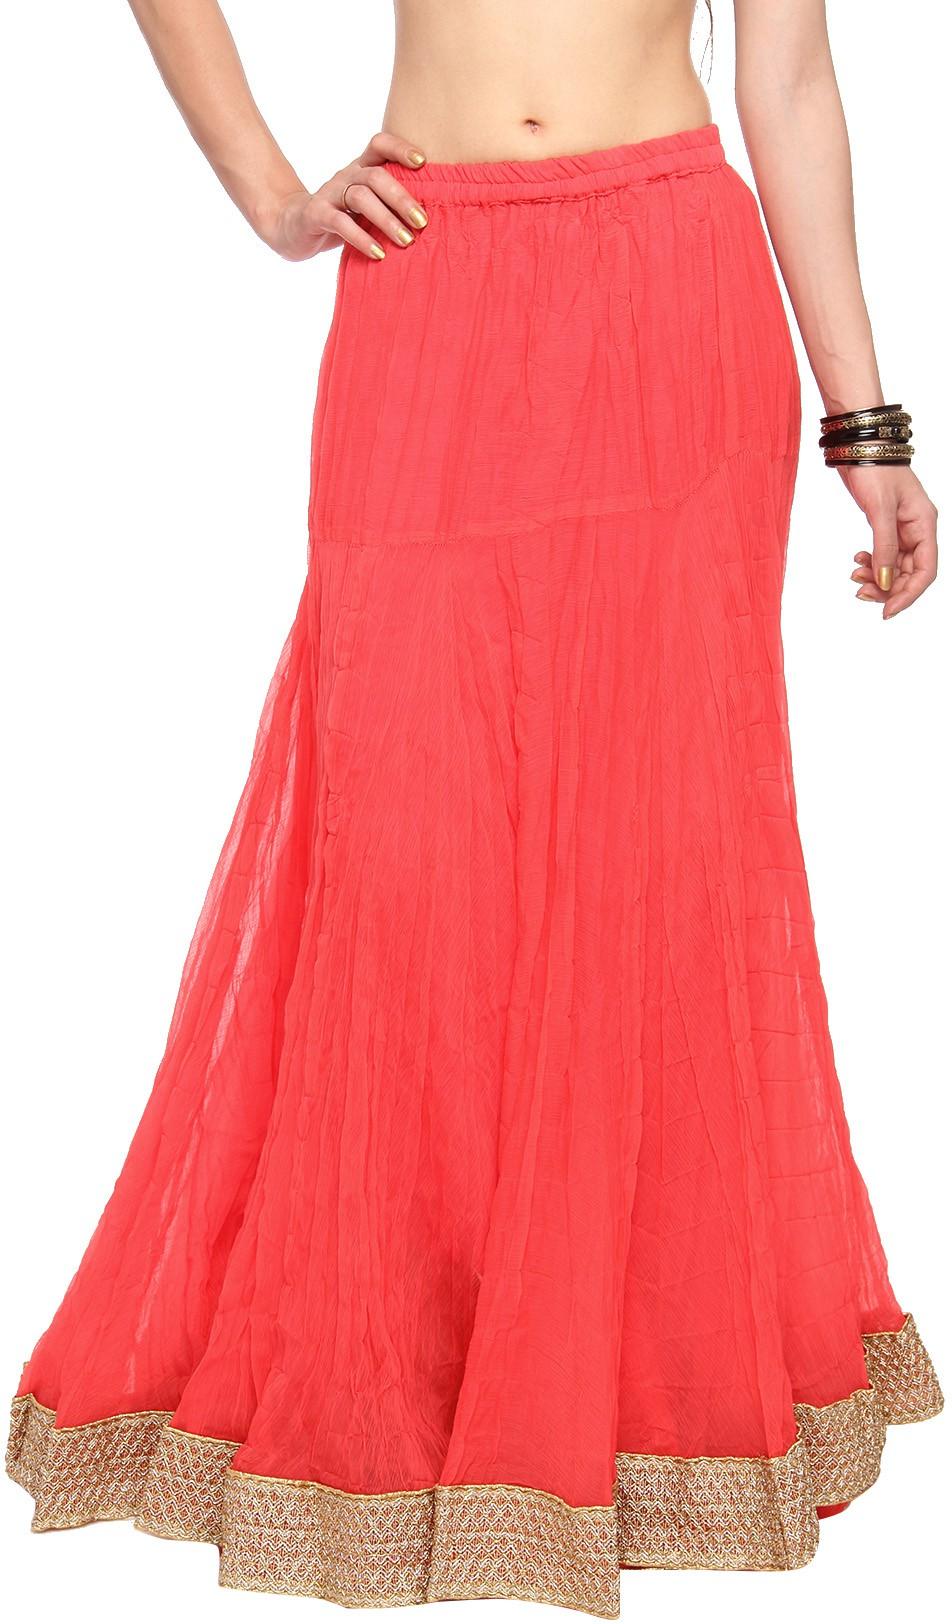 Mina Bazaar Solid Womens A-line Orange Skirt